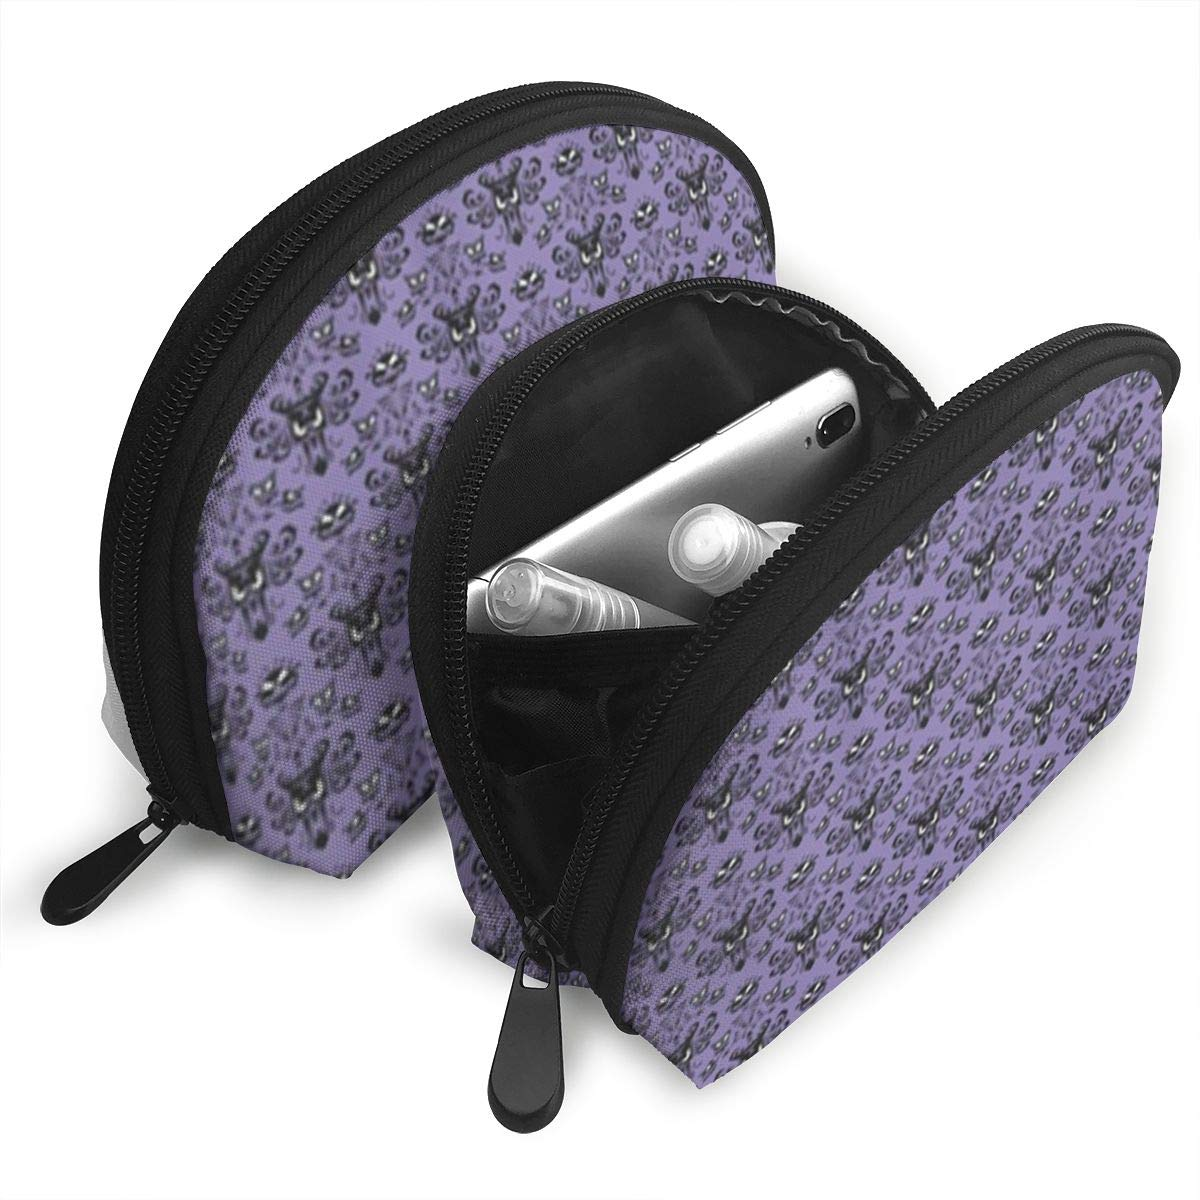 0a0122d07322 Amazon.com: JDISJLJ Cosmetic Travel Bag Haunted Mansion Shell ...